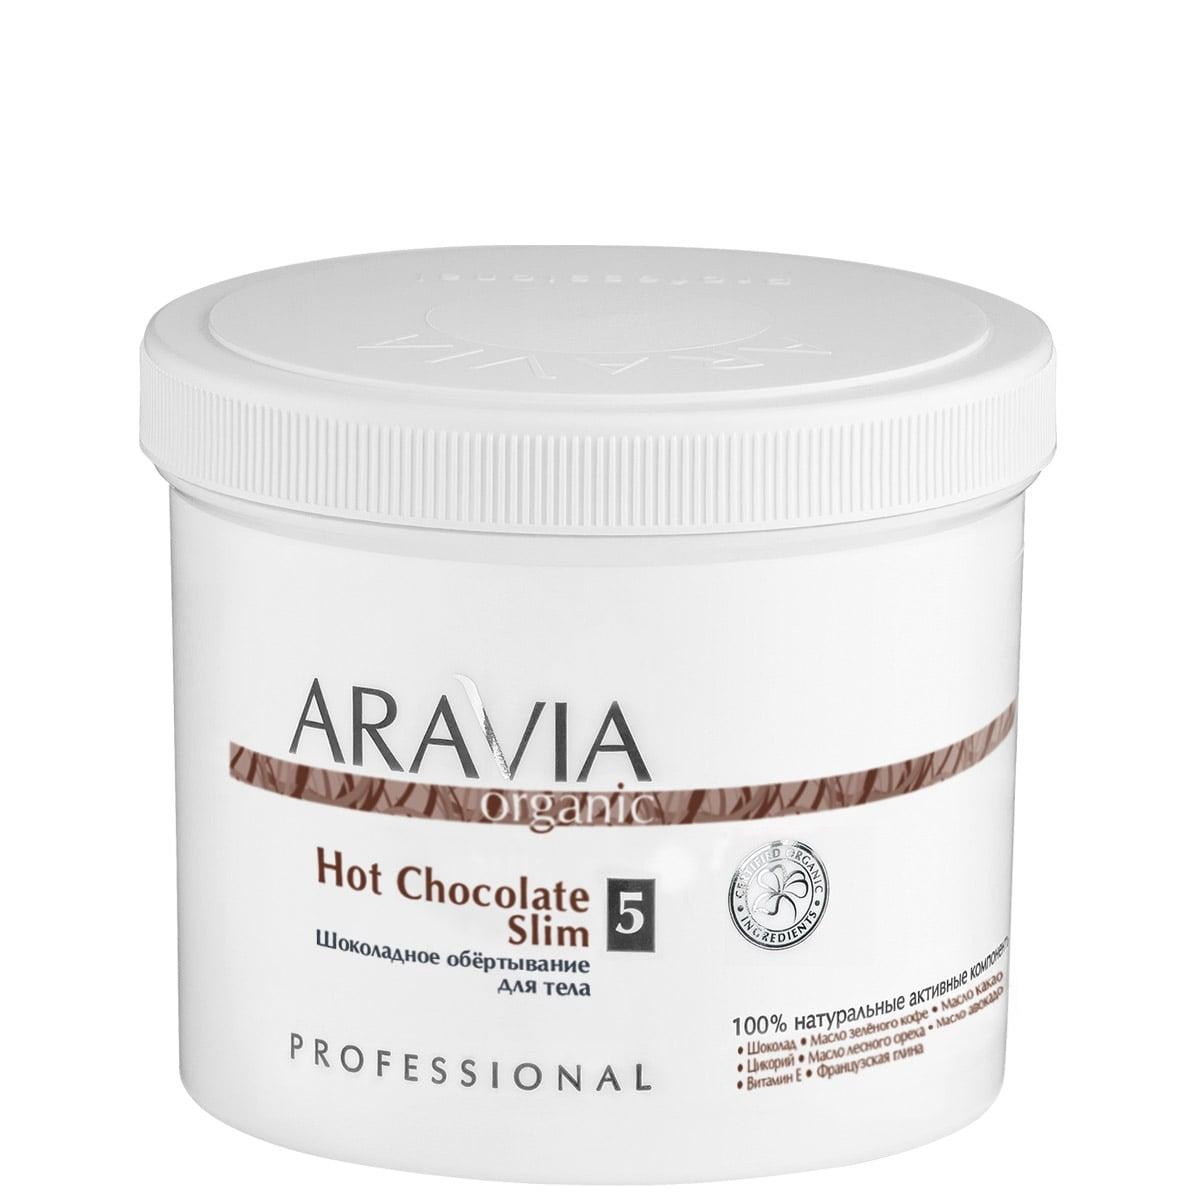 ARAVIA Organic Шоколадное Обёртывание для Тела Hot Chocolate Slim, 550 мл